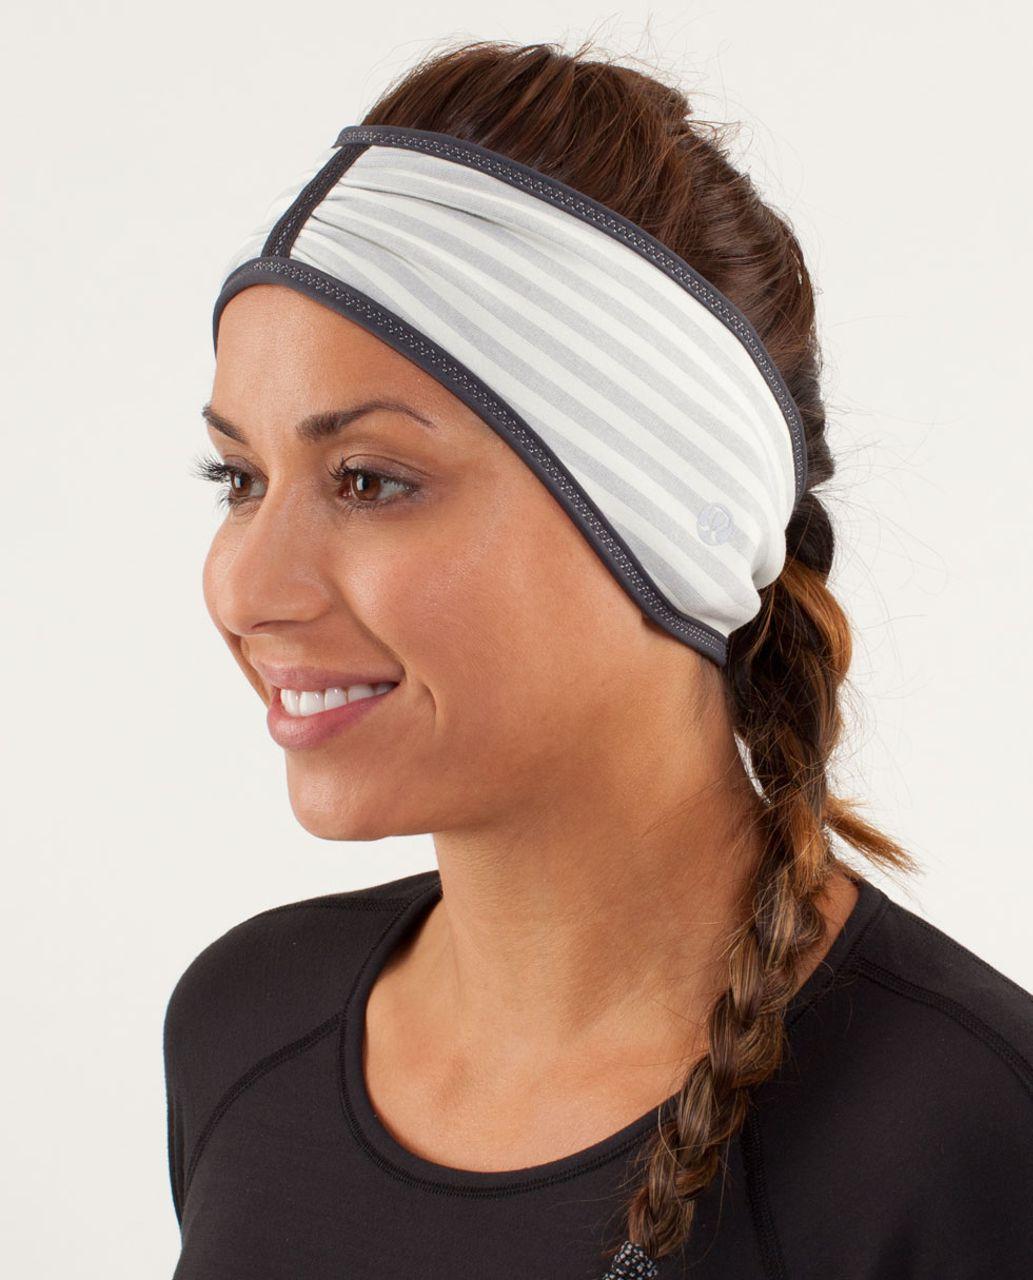 Lululemon Brisk Run Headband - Macro Micro Stripe Polar Cream H. Silver Slate / Heathered Coal